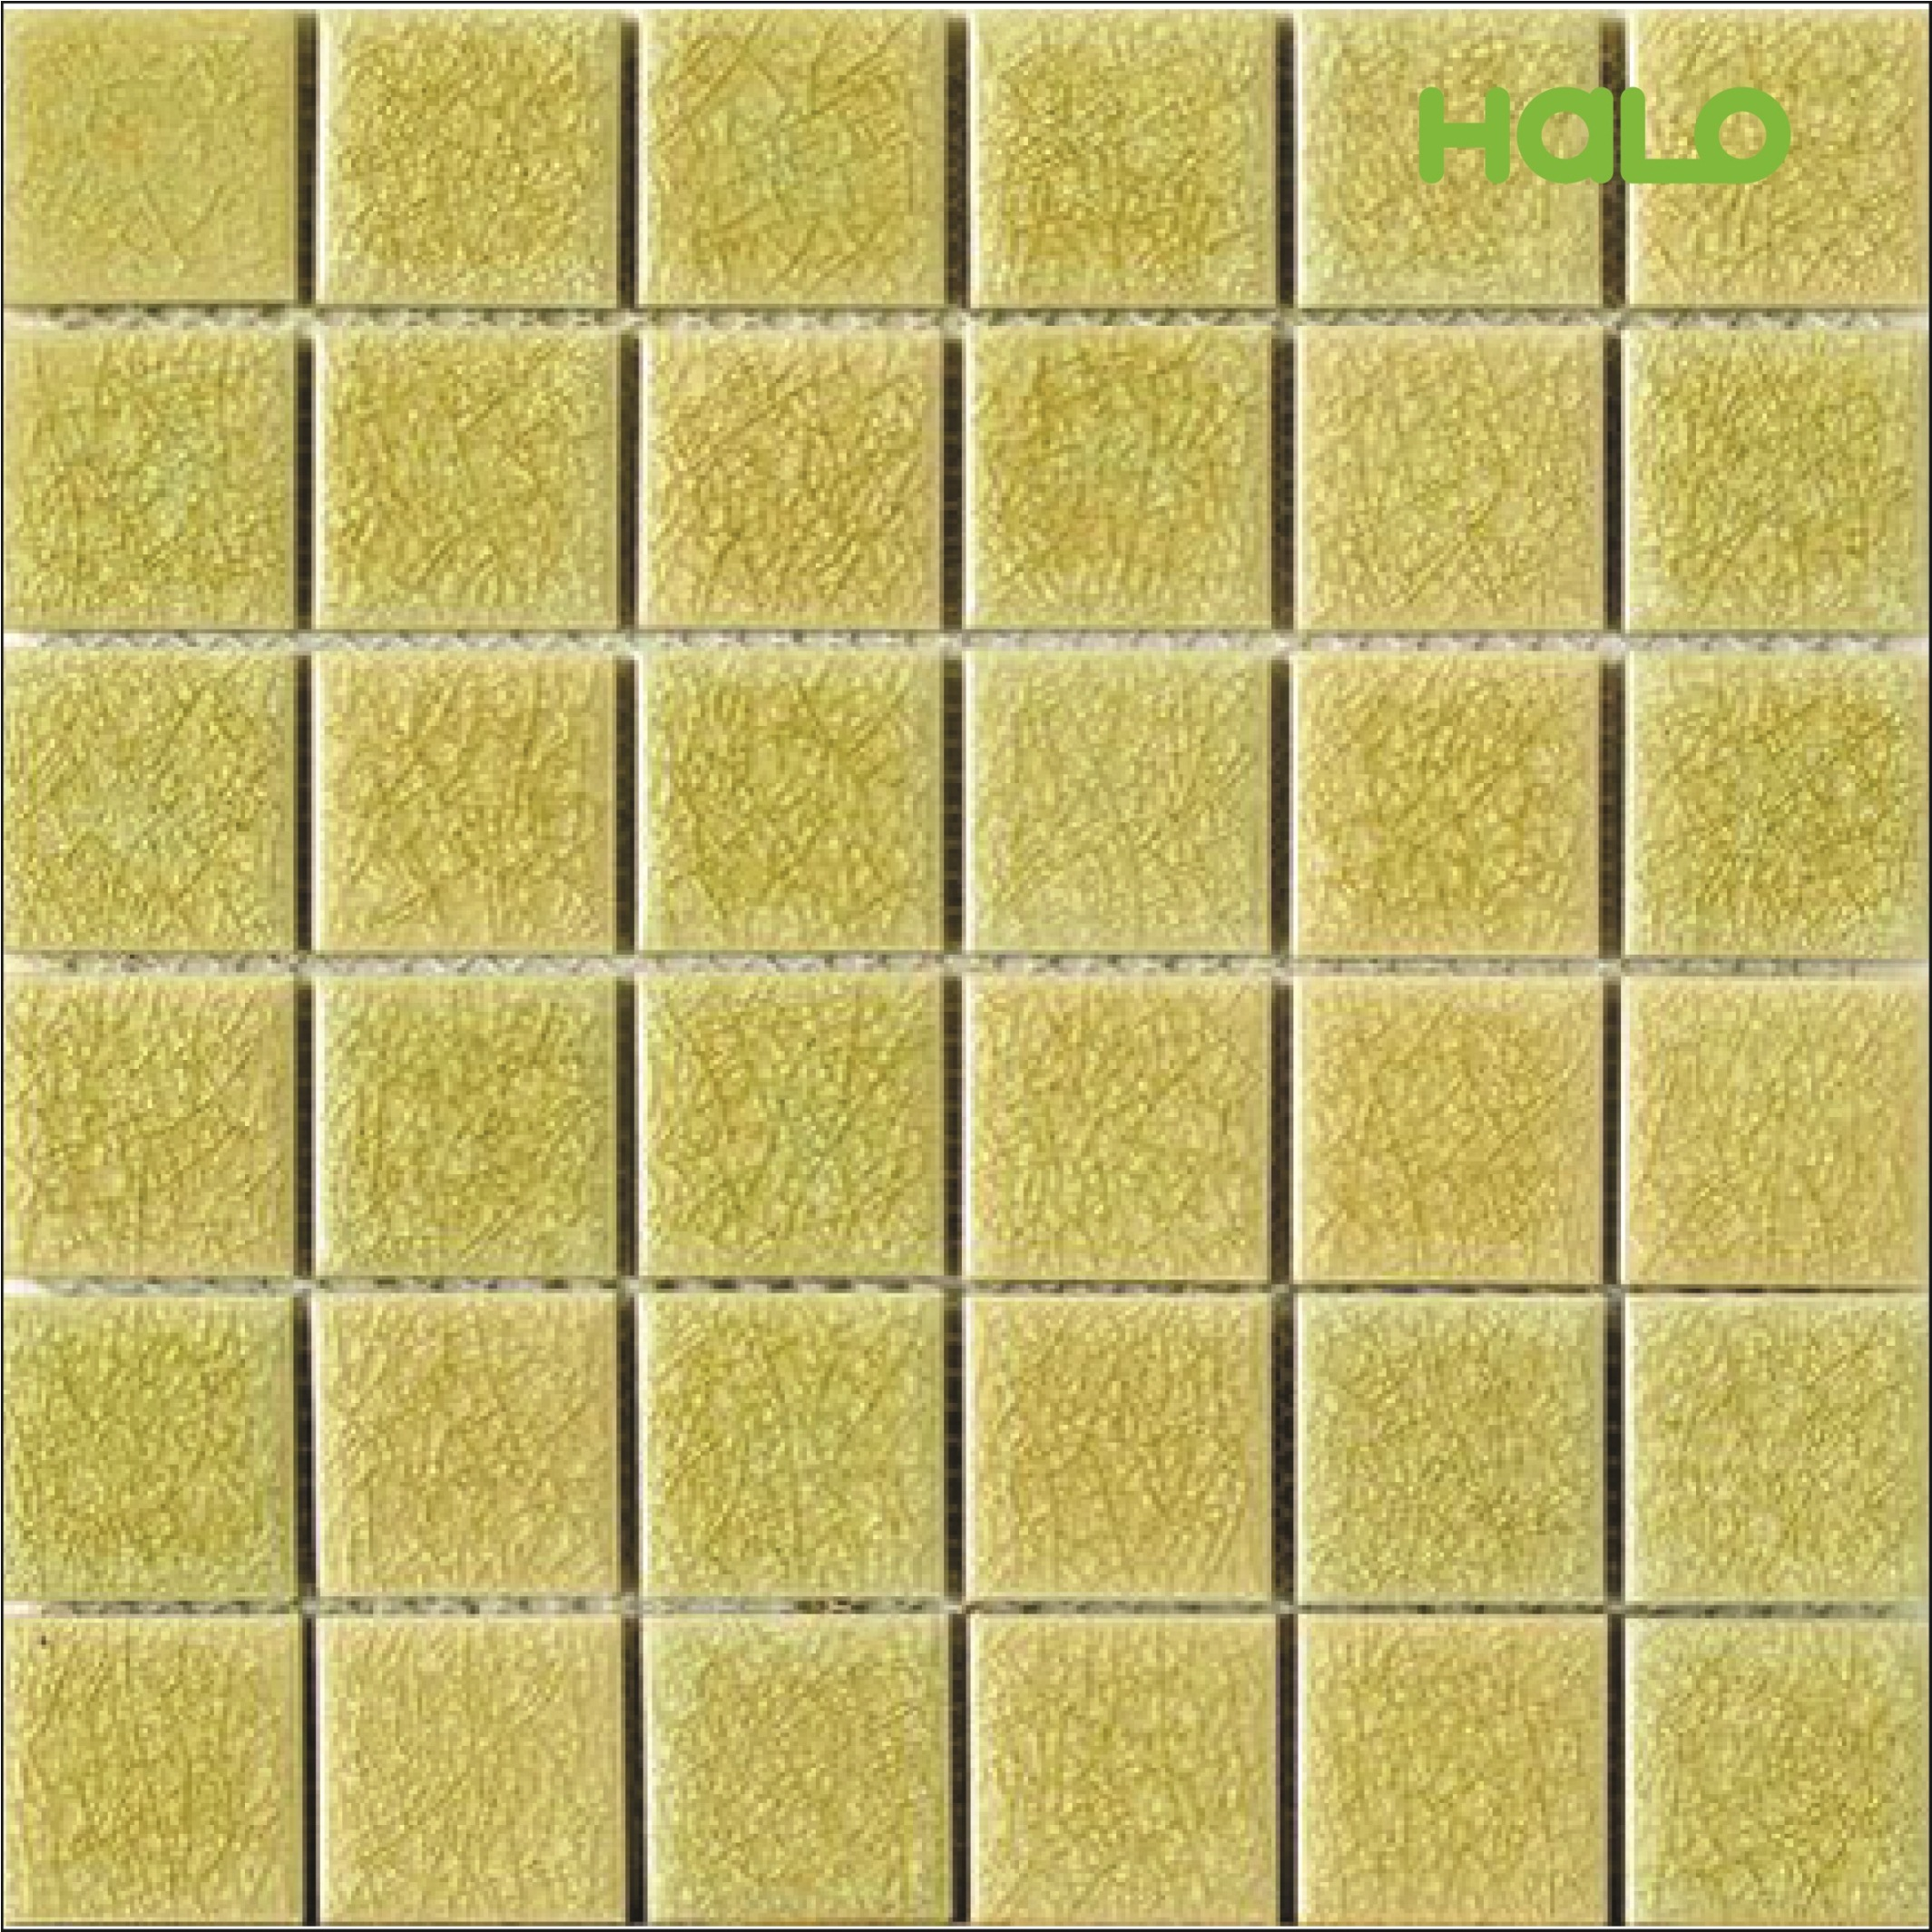 Gạch mosaic men rạn - XFB48031